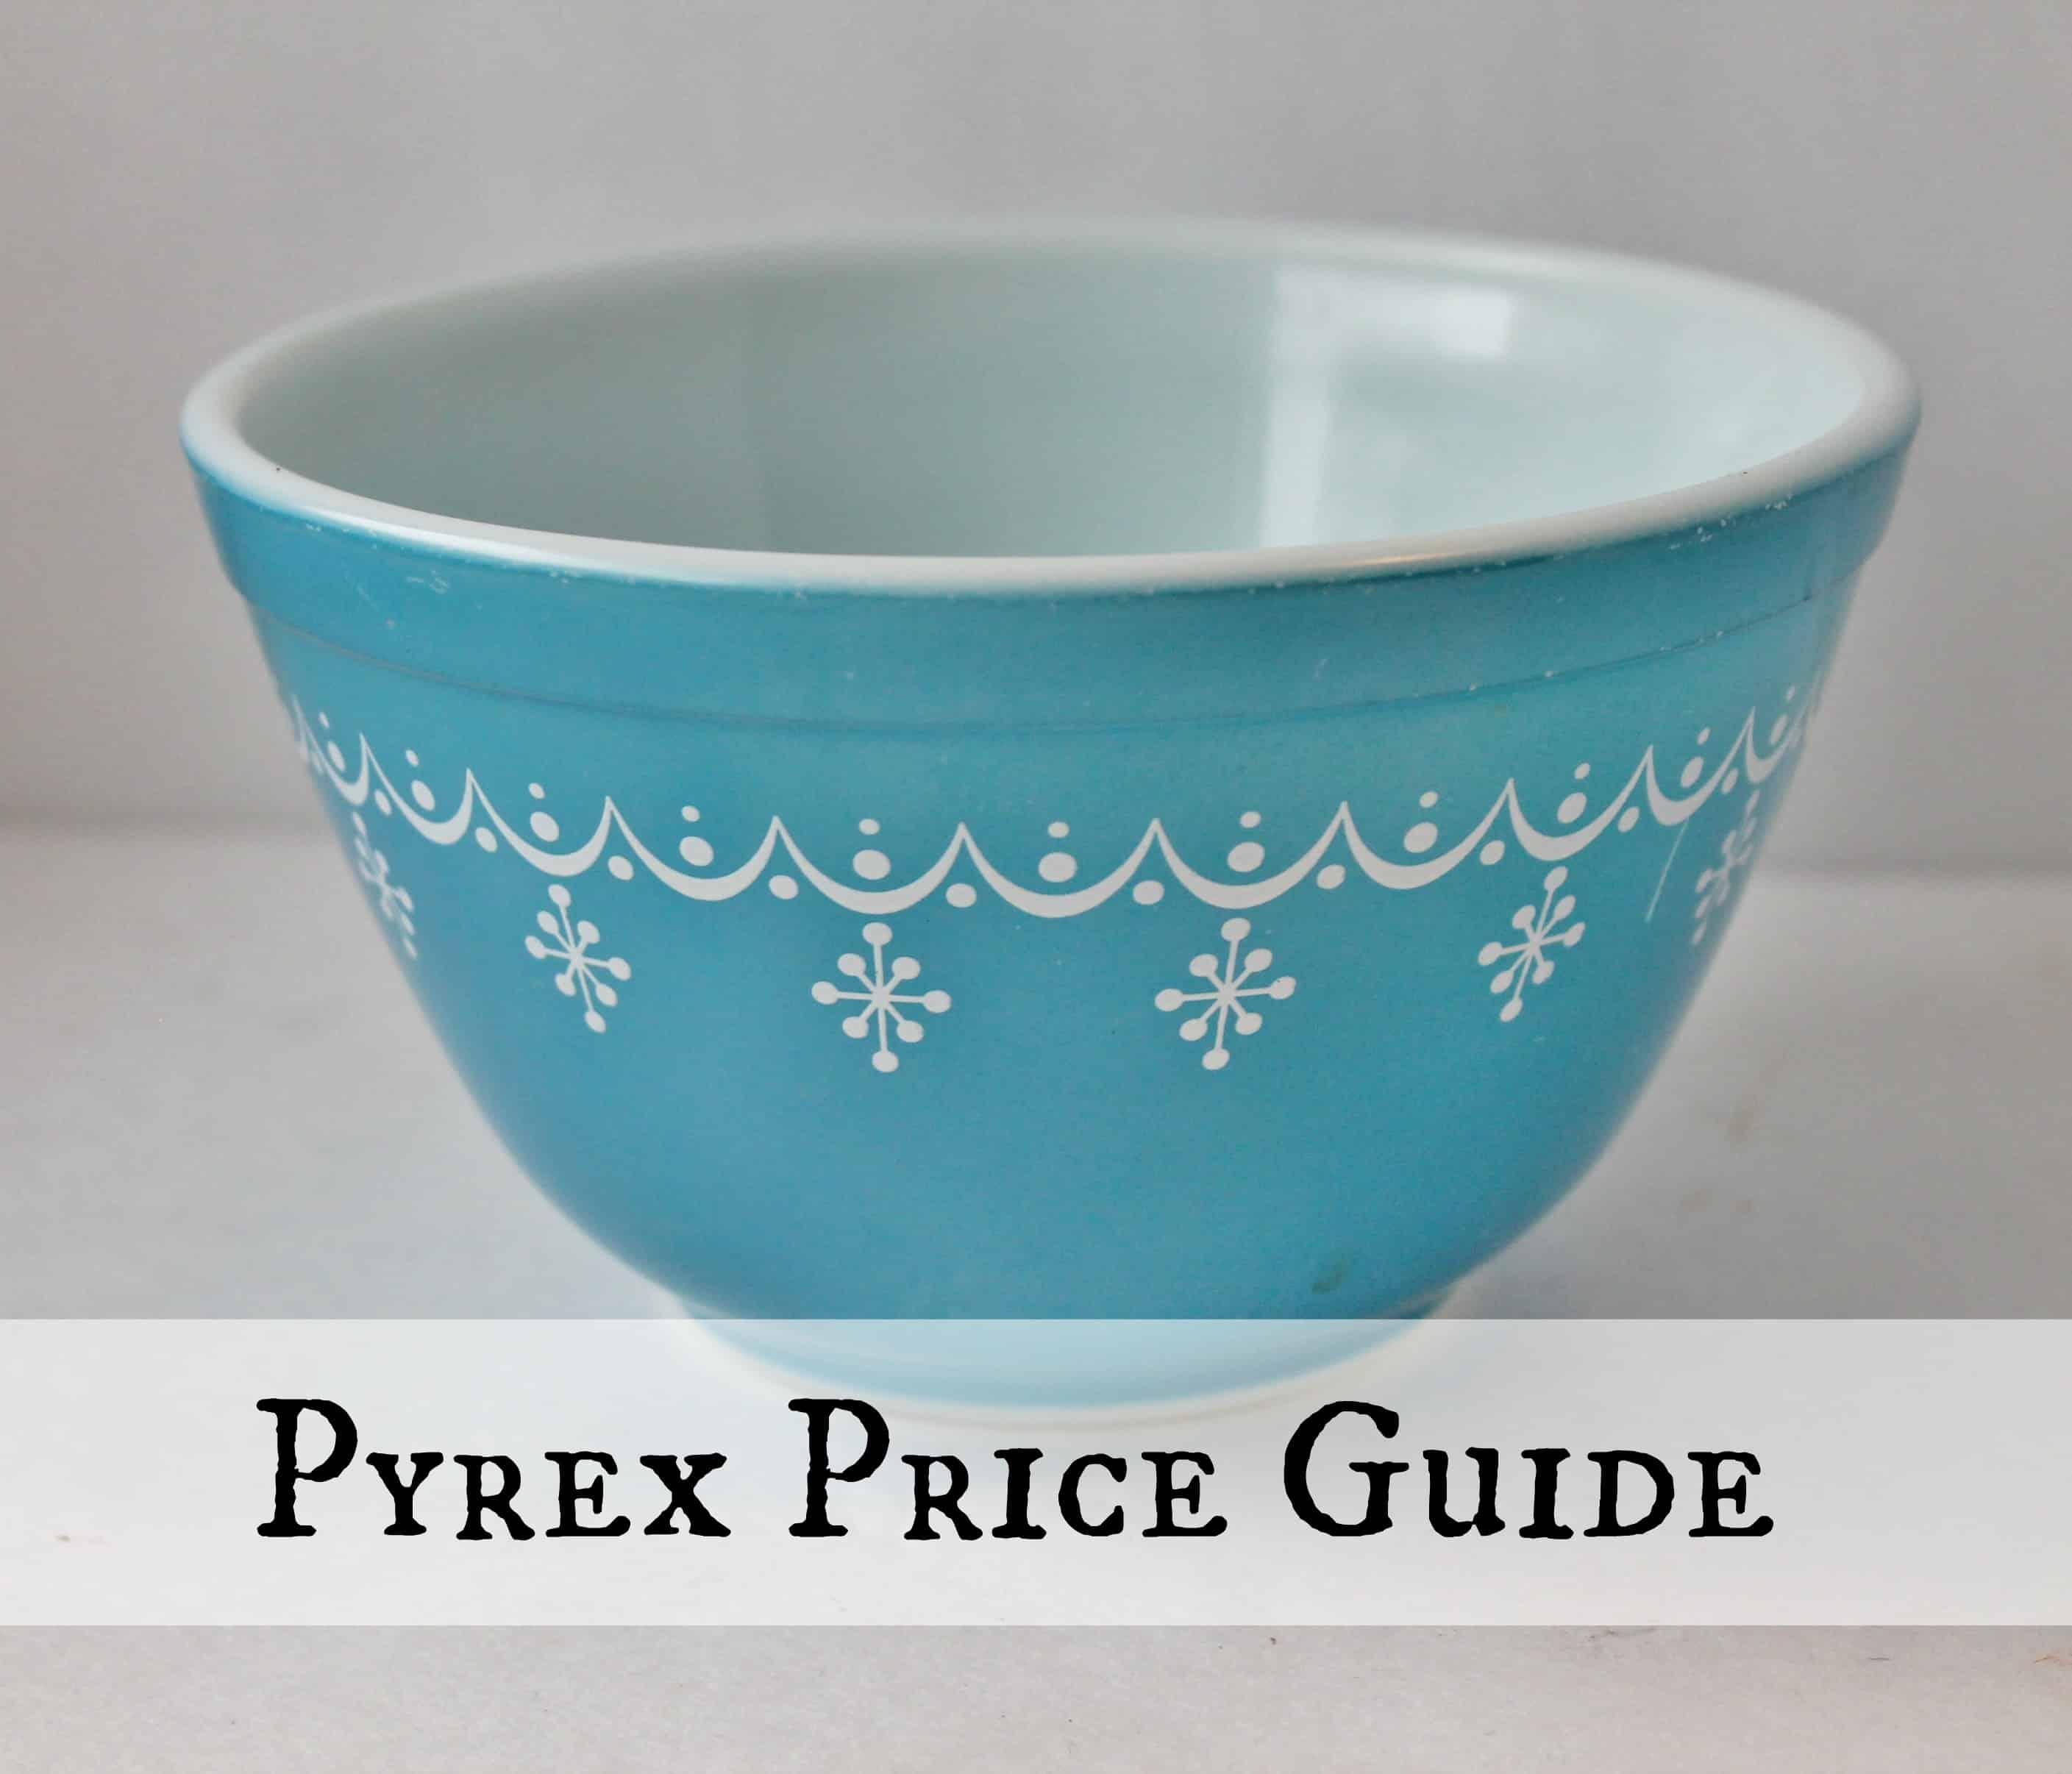 vintage pyrex price guide adirondack girl heart. Black Bedroom Furniture Sets. Home Design Ideas